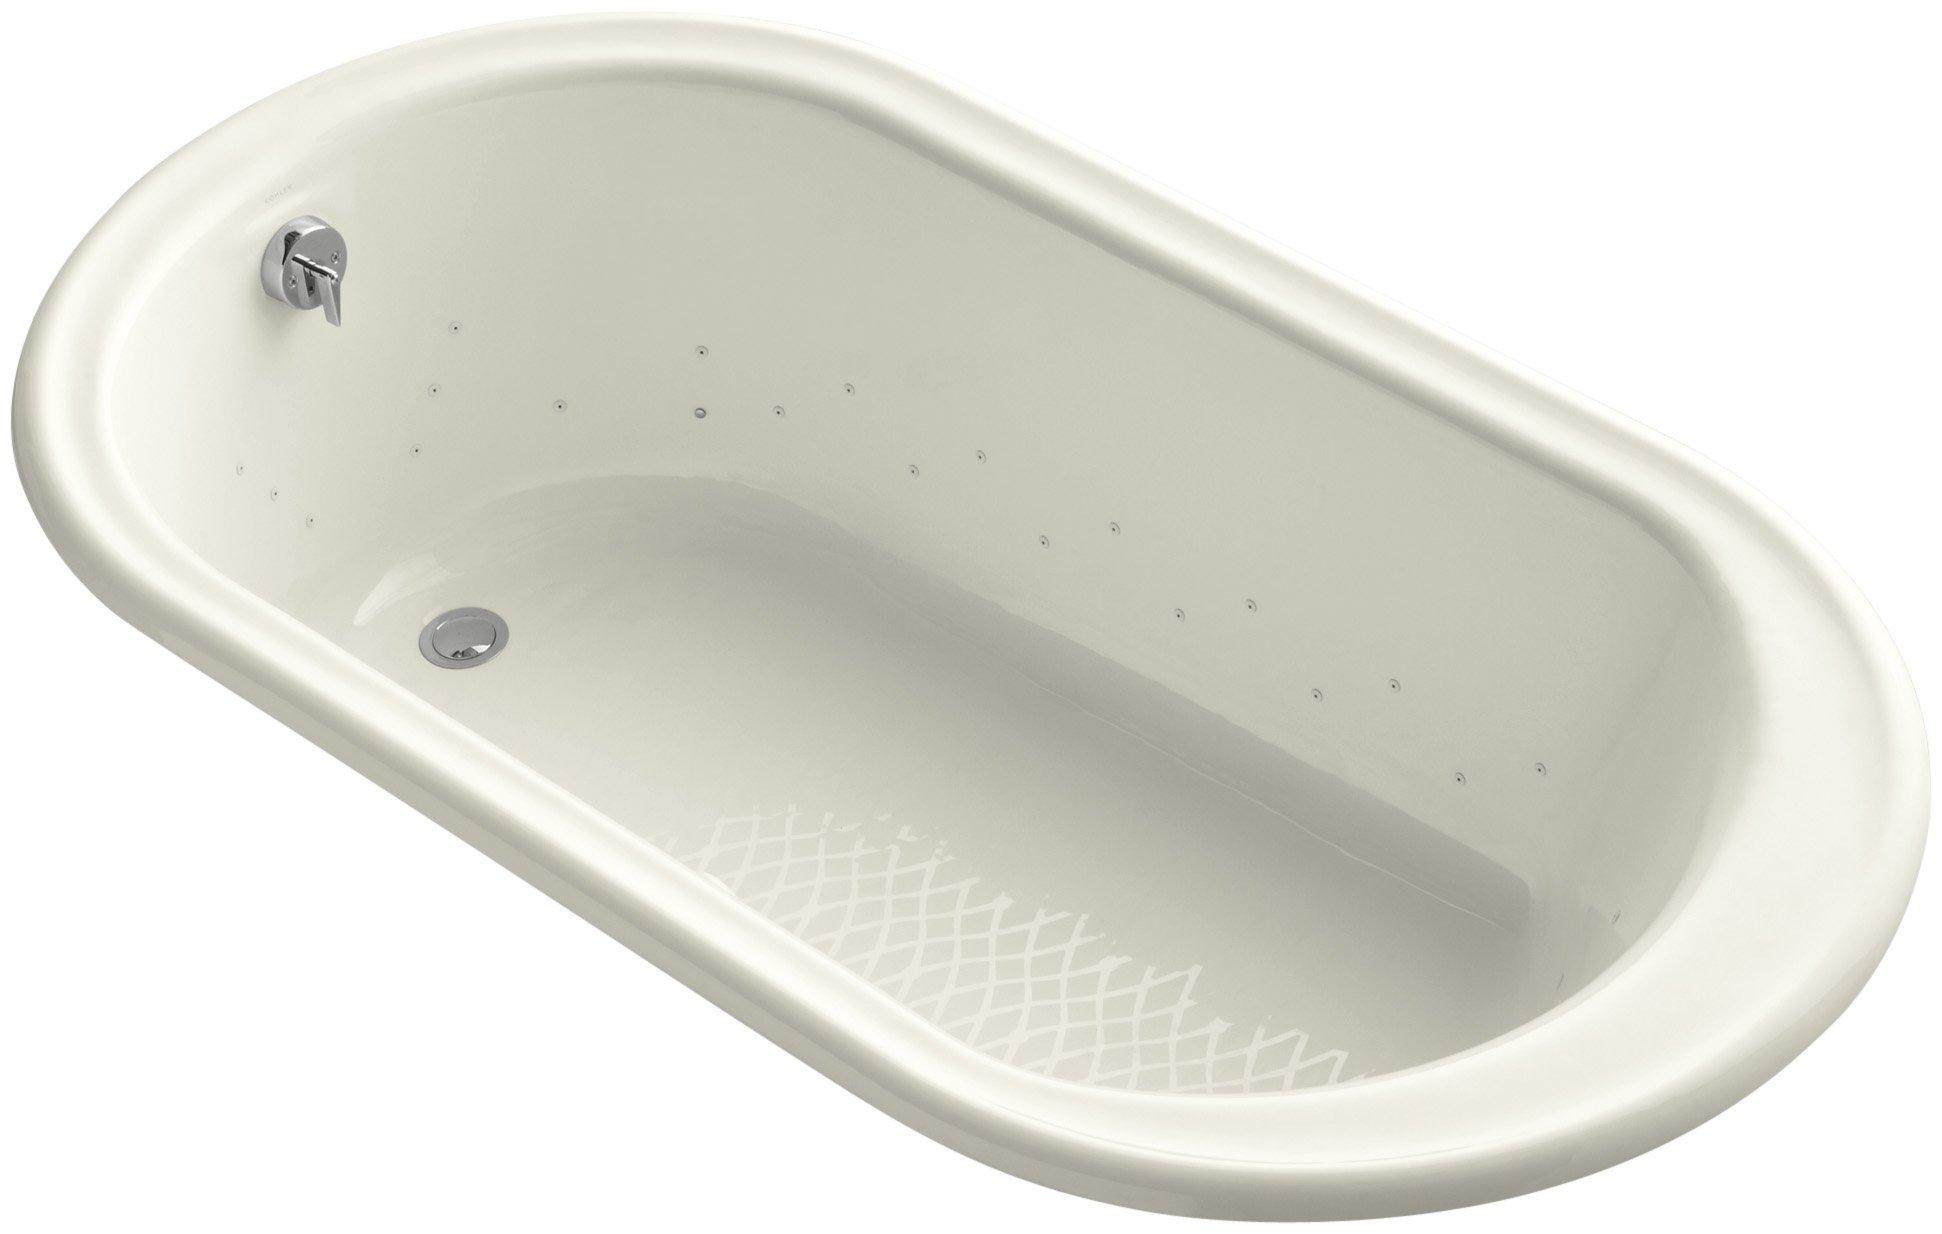 Kohler K-712-G96-96 Iron Works Bubblemassage 5.5Ft Bath with Biscuit Jet Color, Biscuit